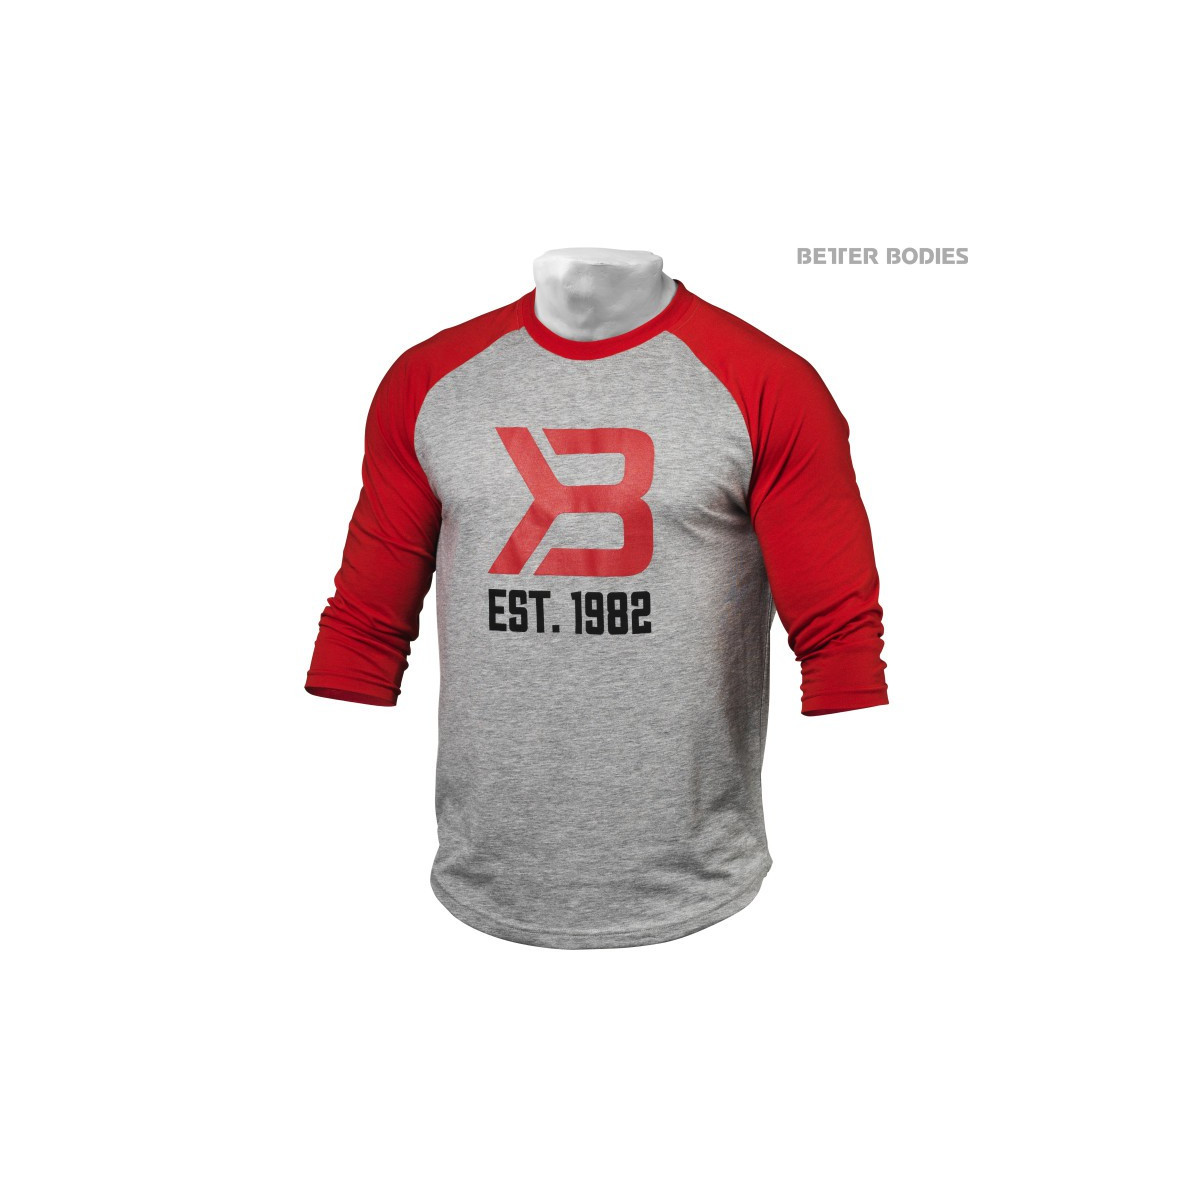 MENS BASEBALL TEE - Red/Grey Melange